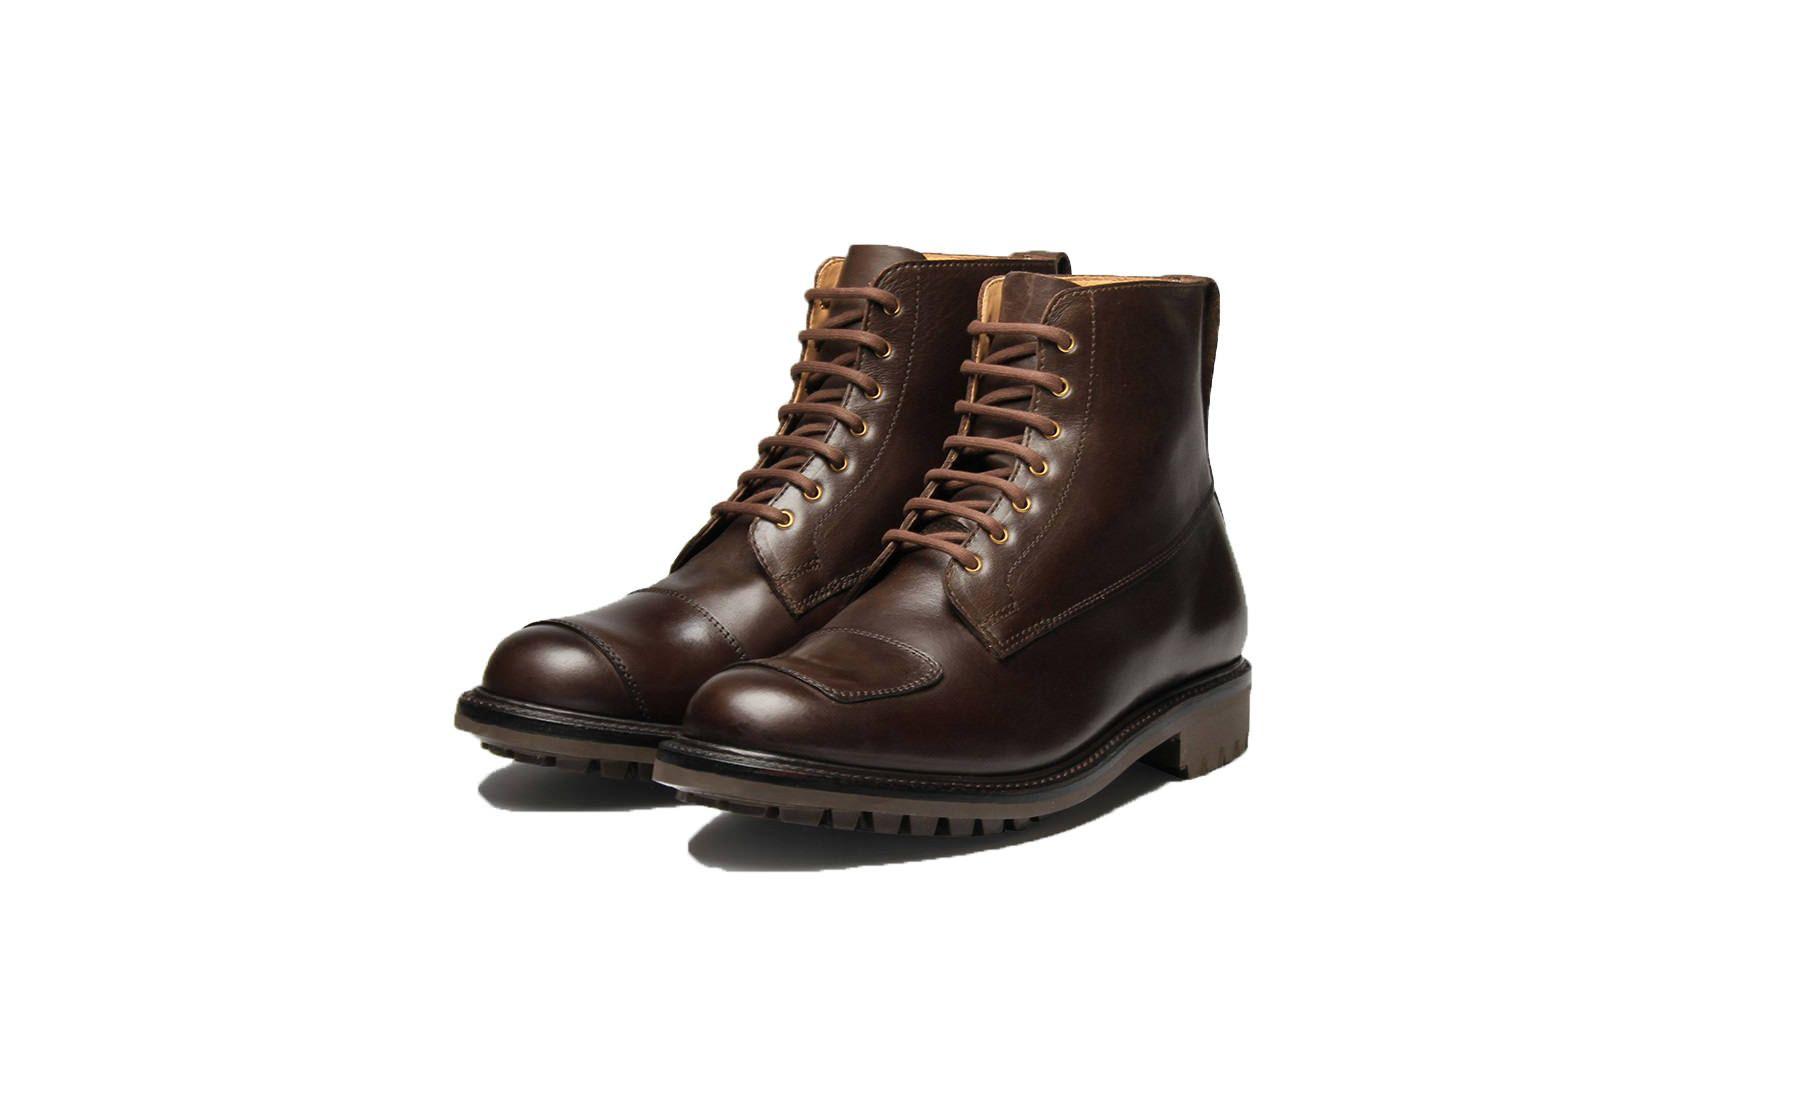 Edwin & Blitz Custom Motorcycle Boots | Necessary Roughness